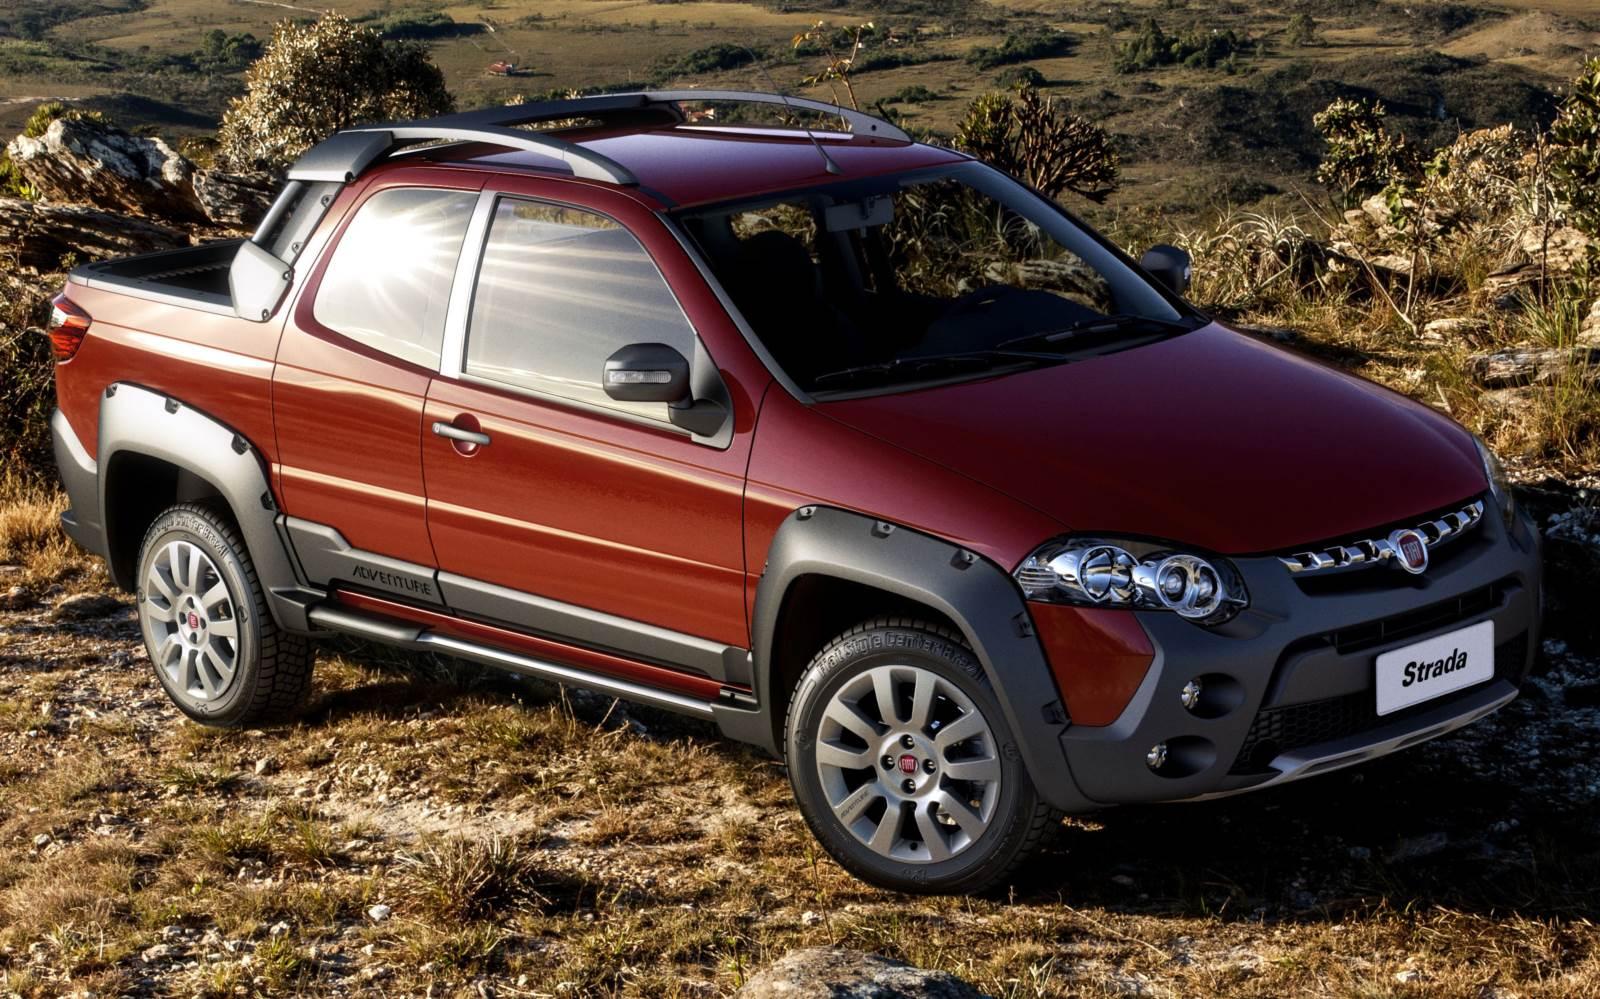 VW Saveiro Cabine Dupla x Fiat Strada Cabine Dupla